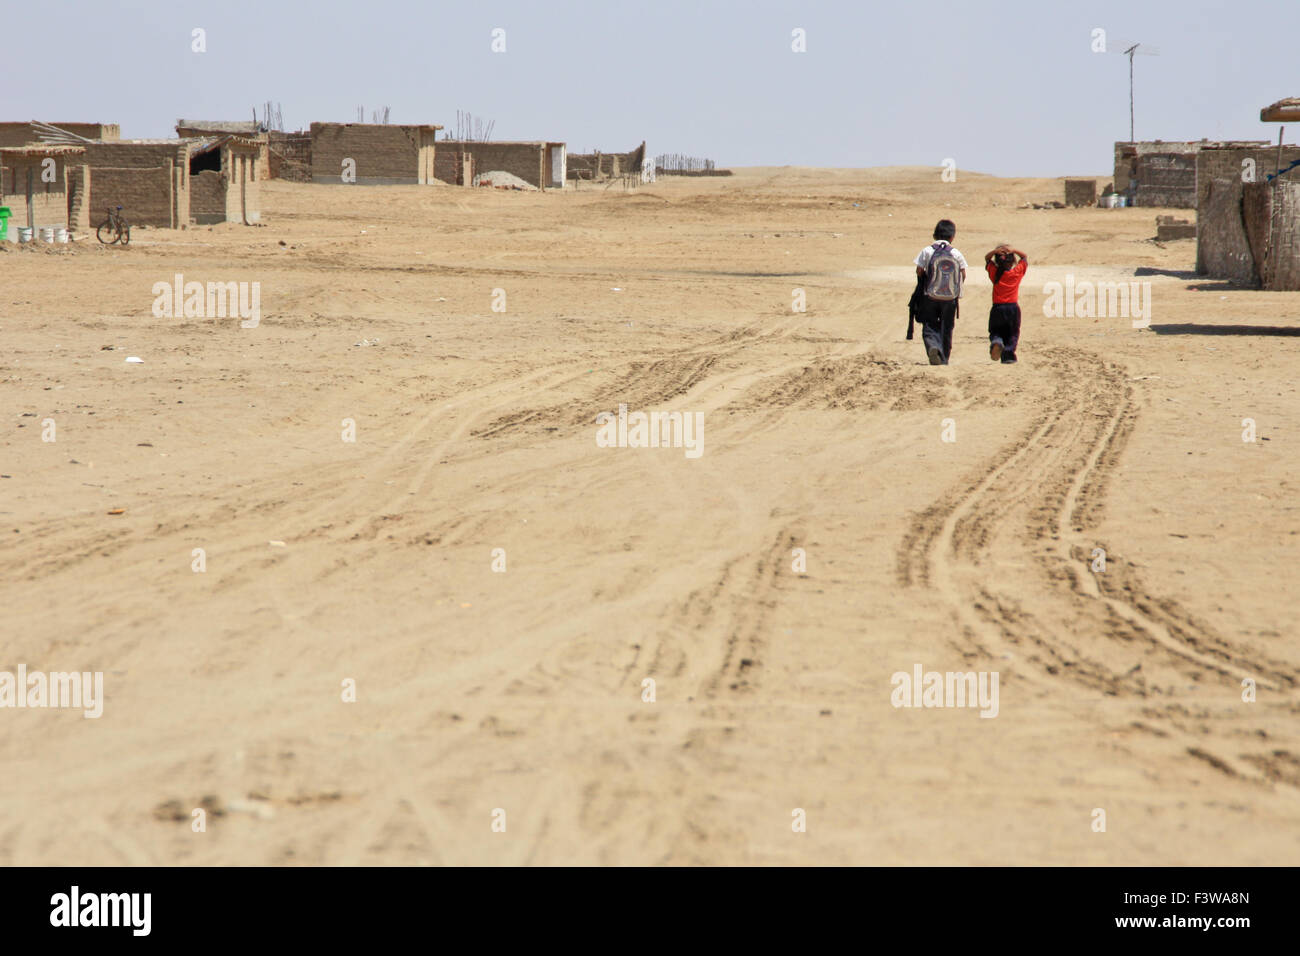 Schoolchildren in the desert Stock Photo